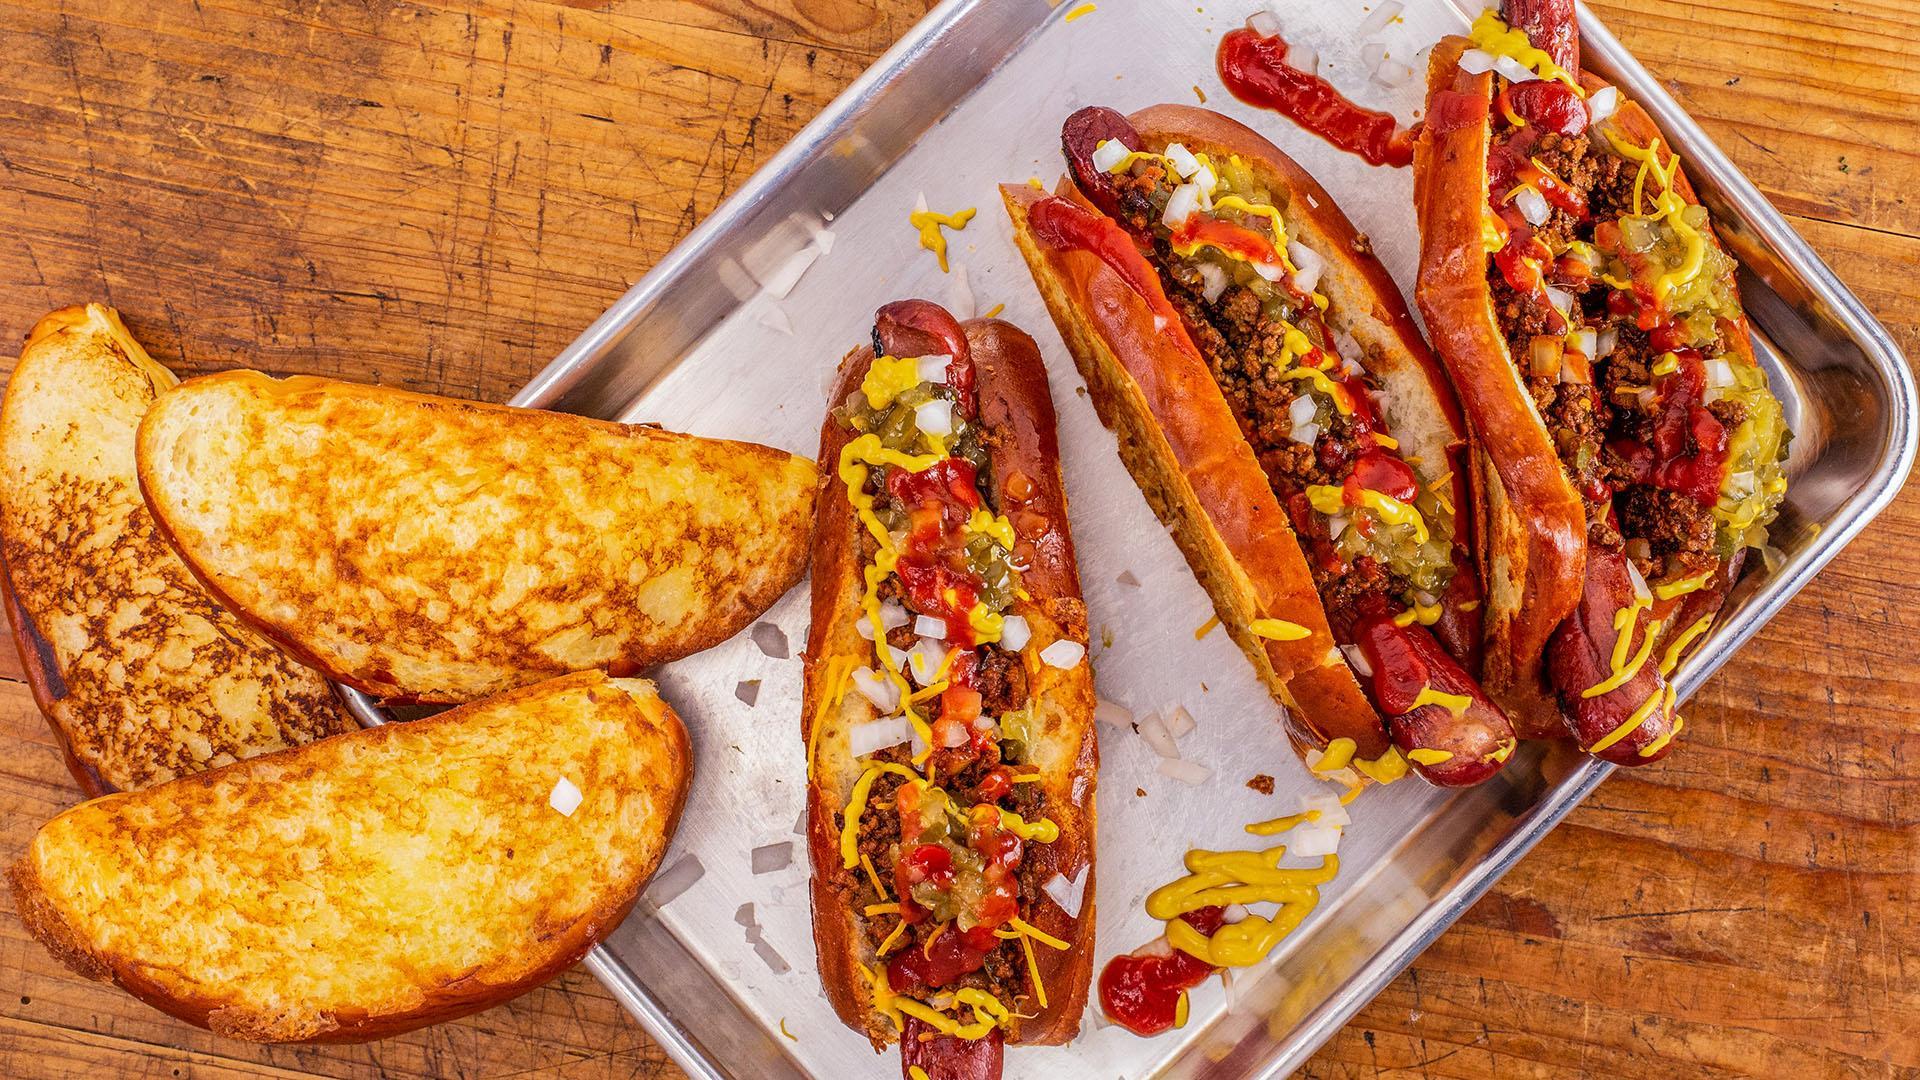 Rachael S Big Bold Chili Cheese Dogs Rachael Ray Show